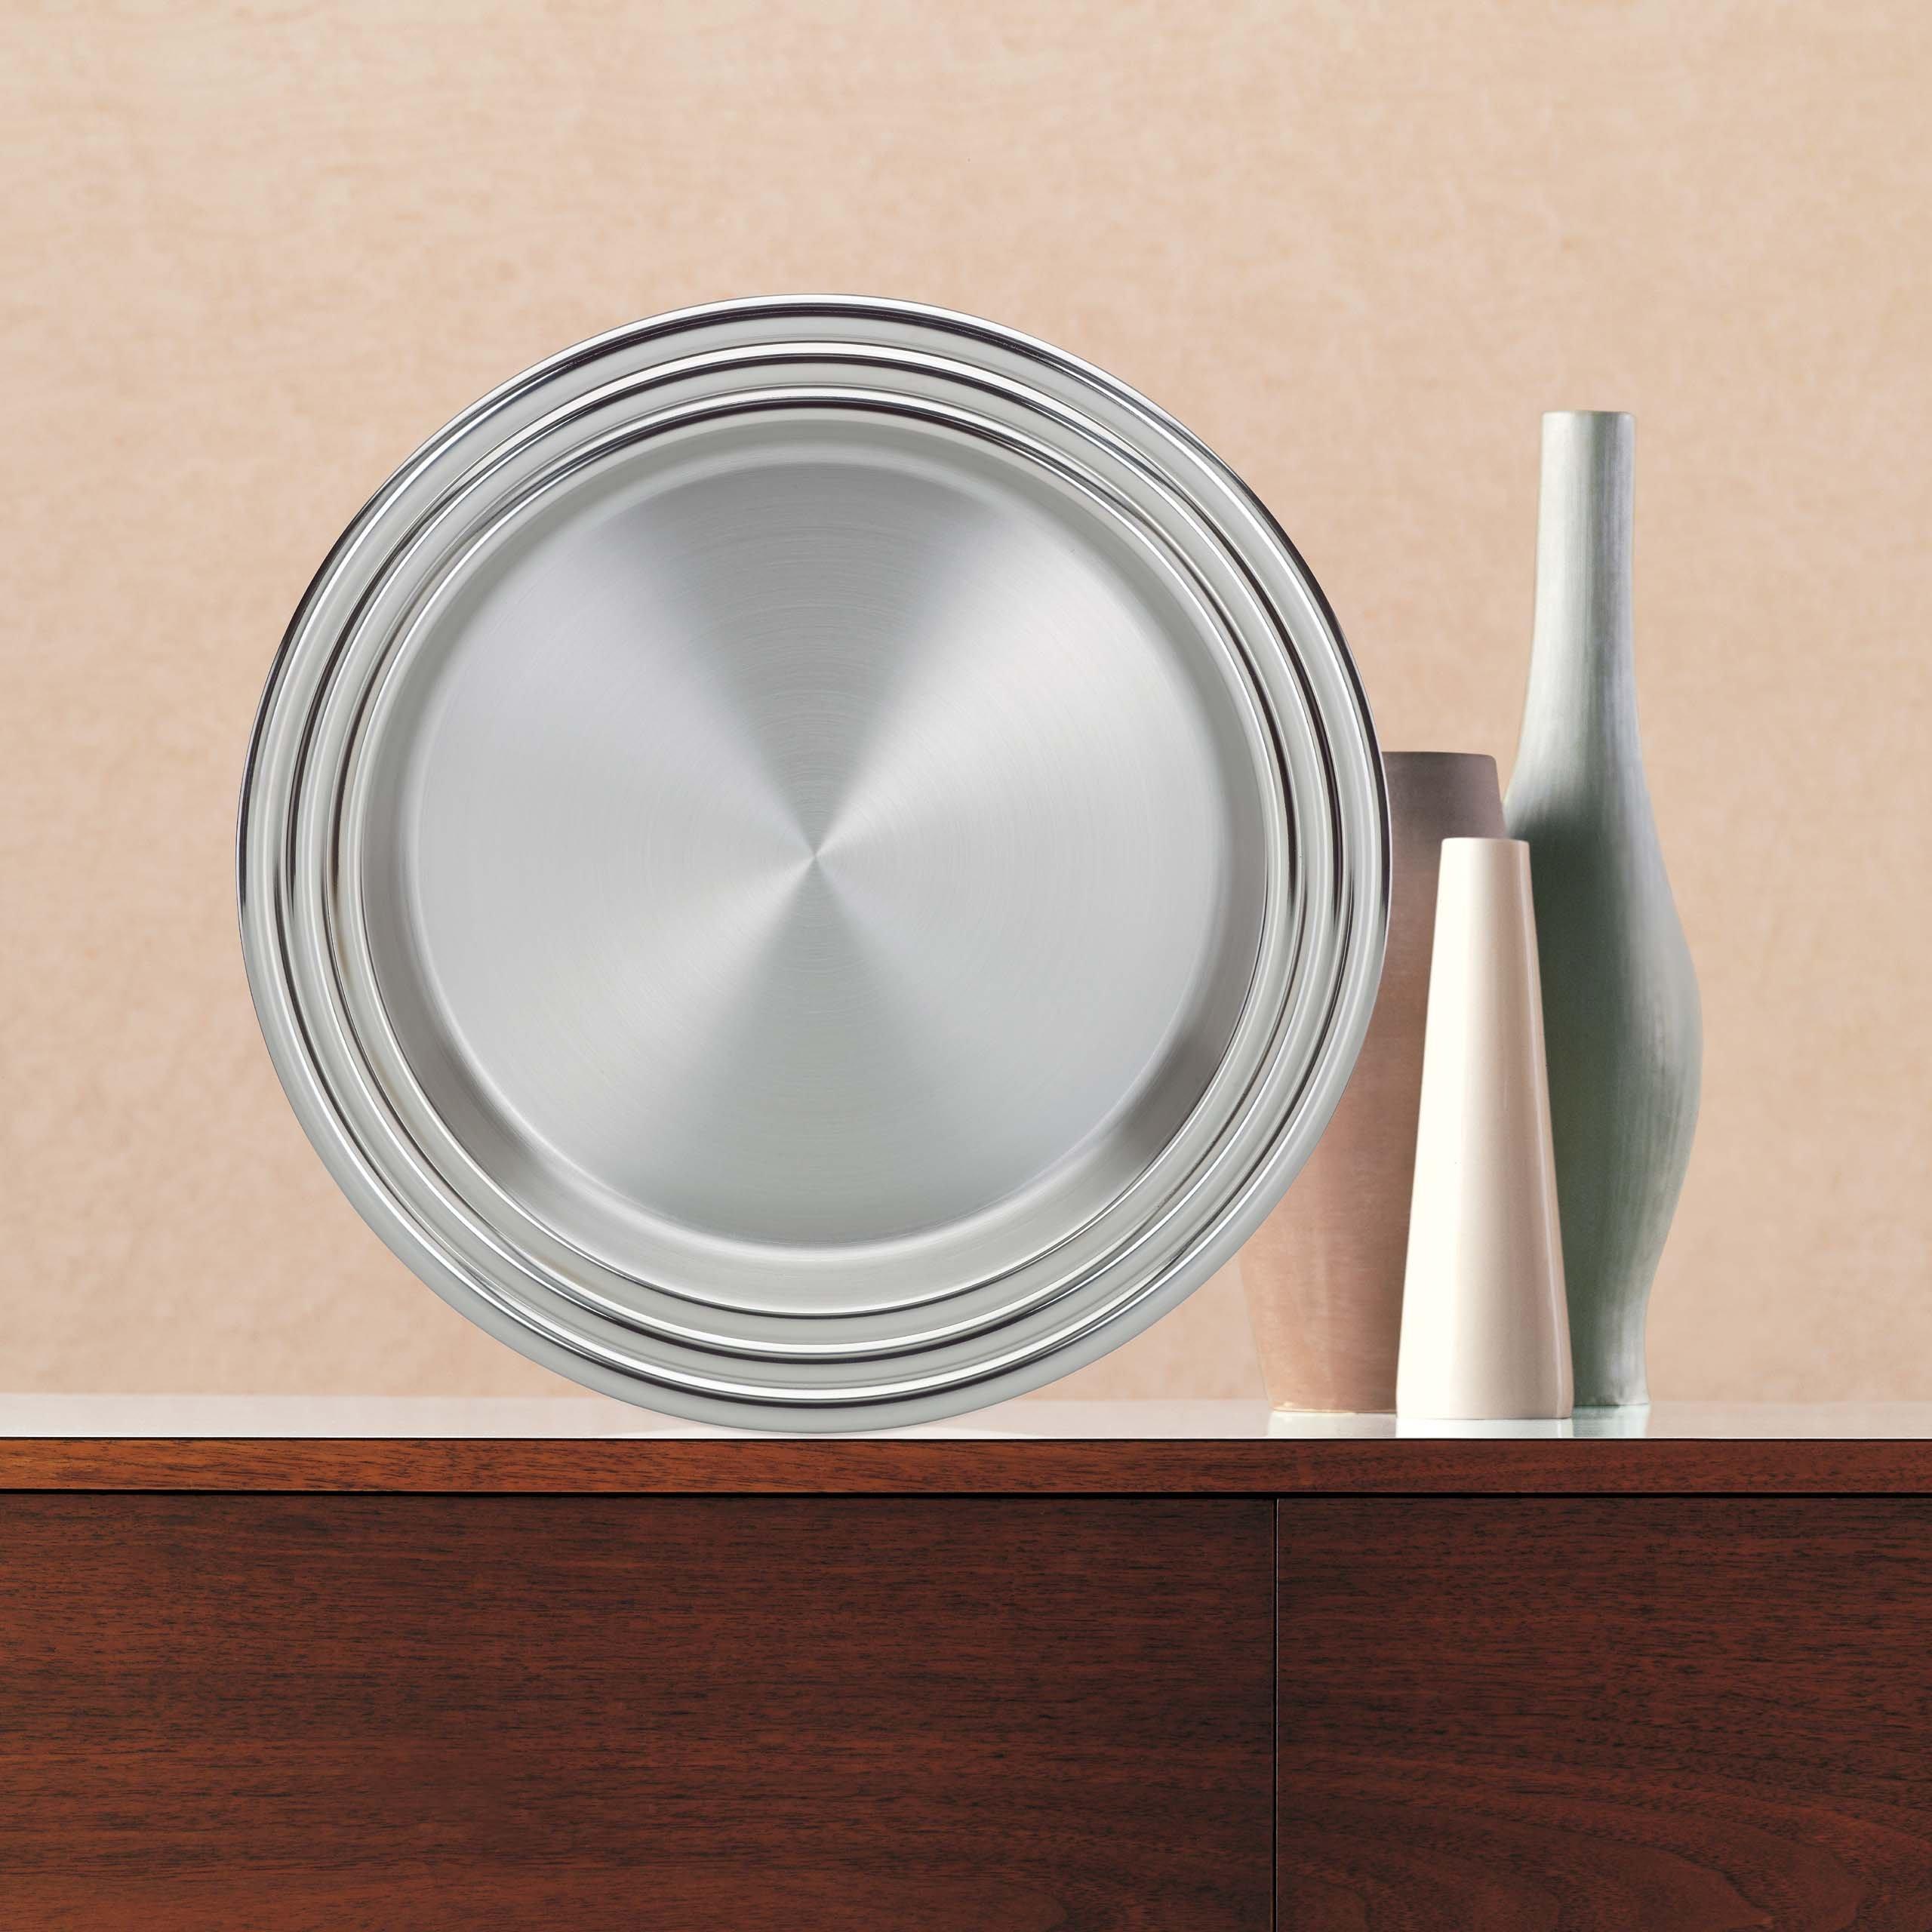 Lenox Tuscany Classics Stainless-Steel Tray by Lenox